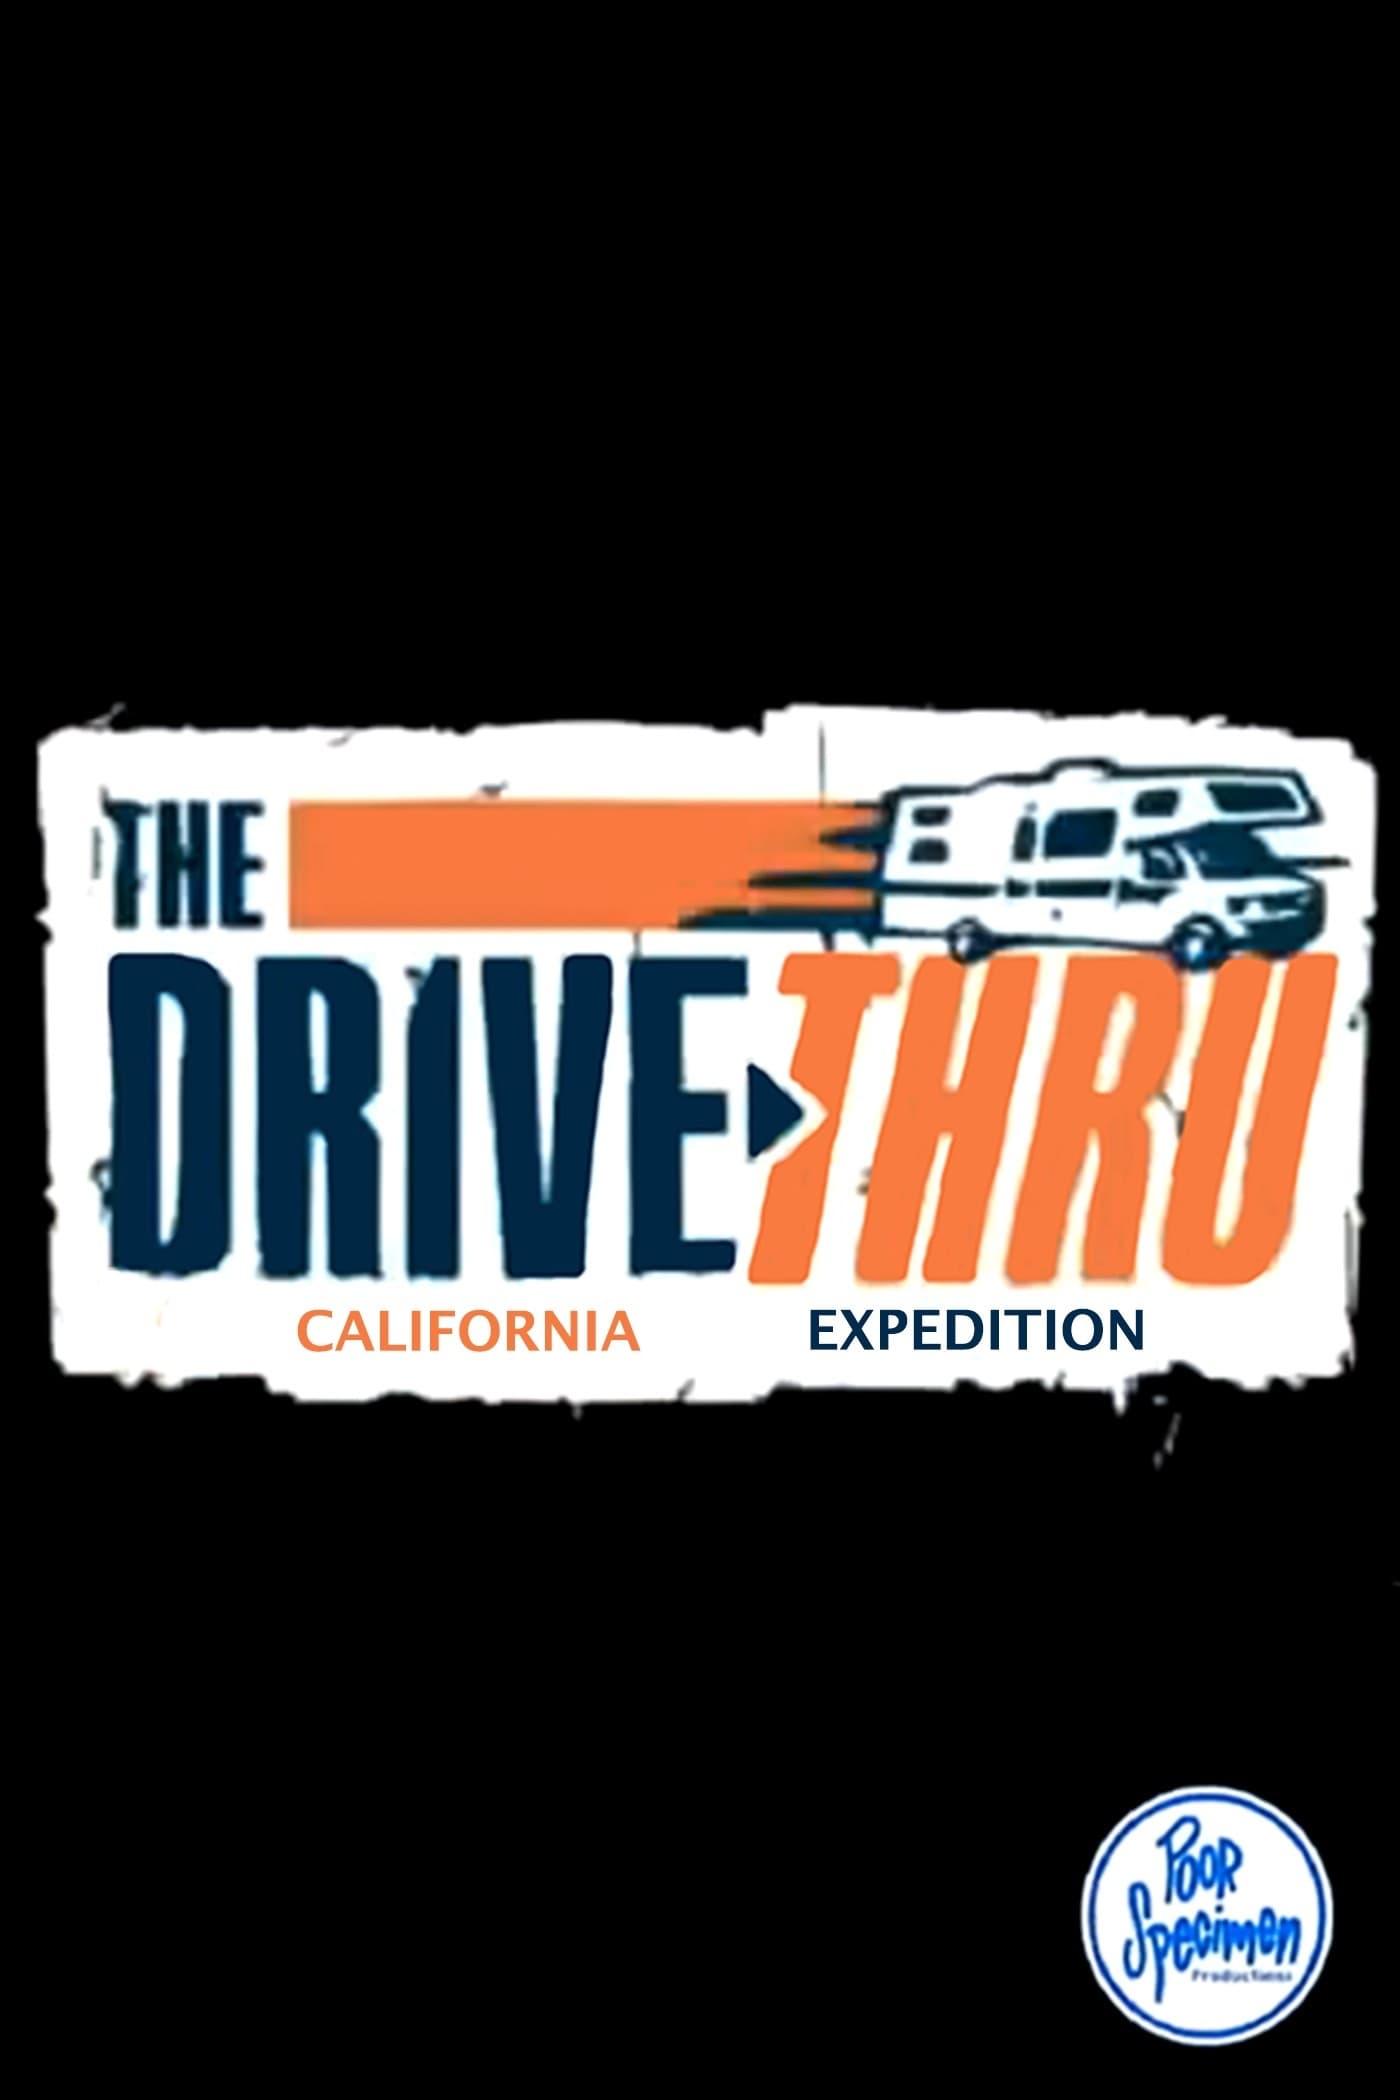 Drive Thru California Expedition